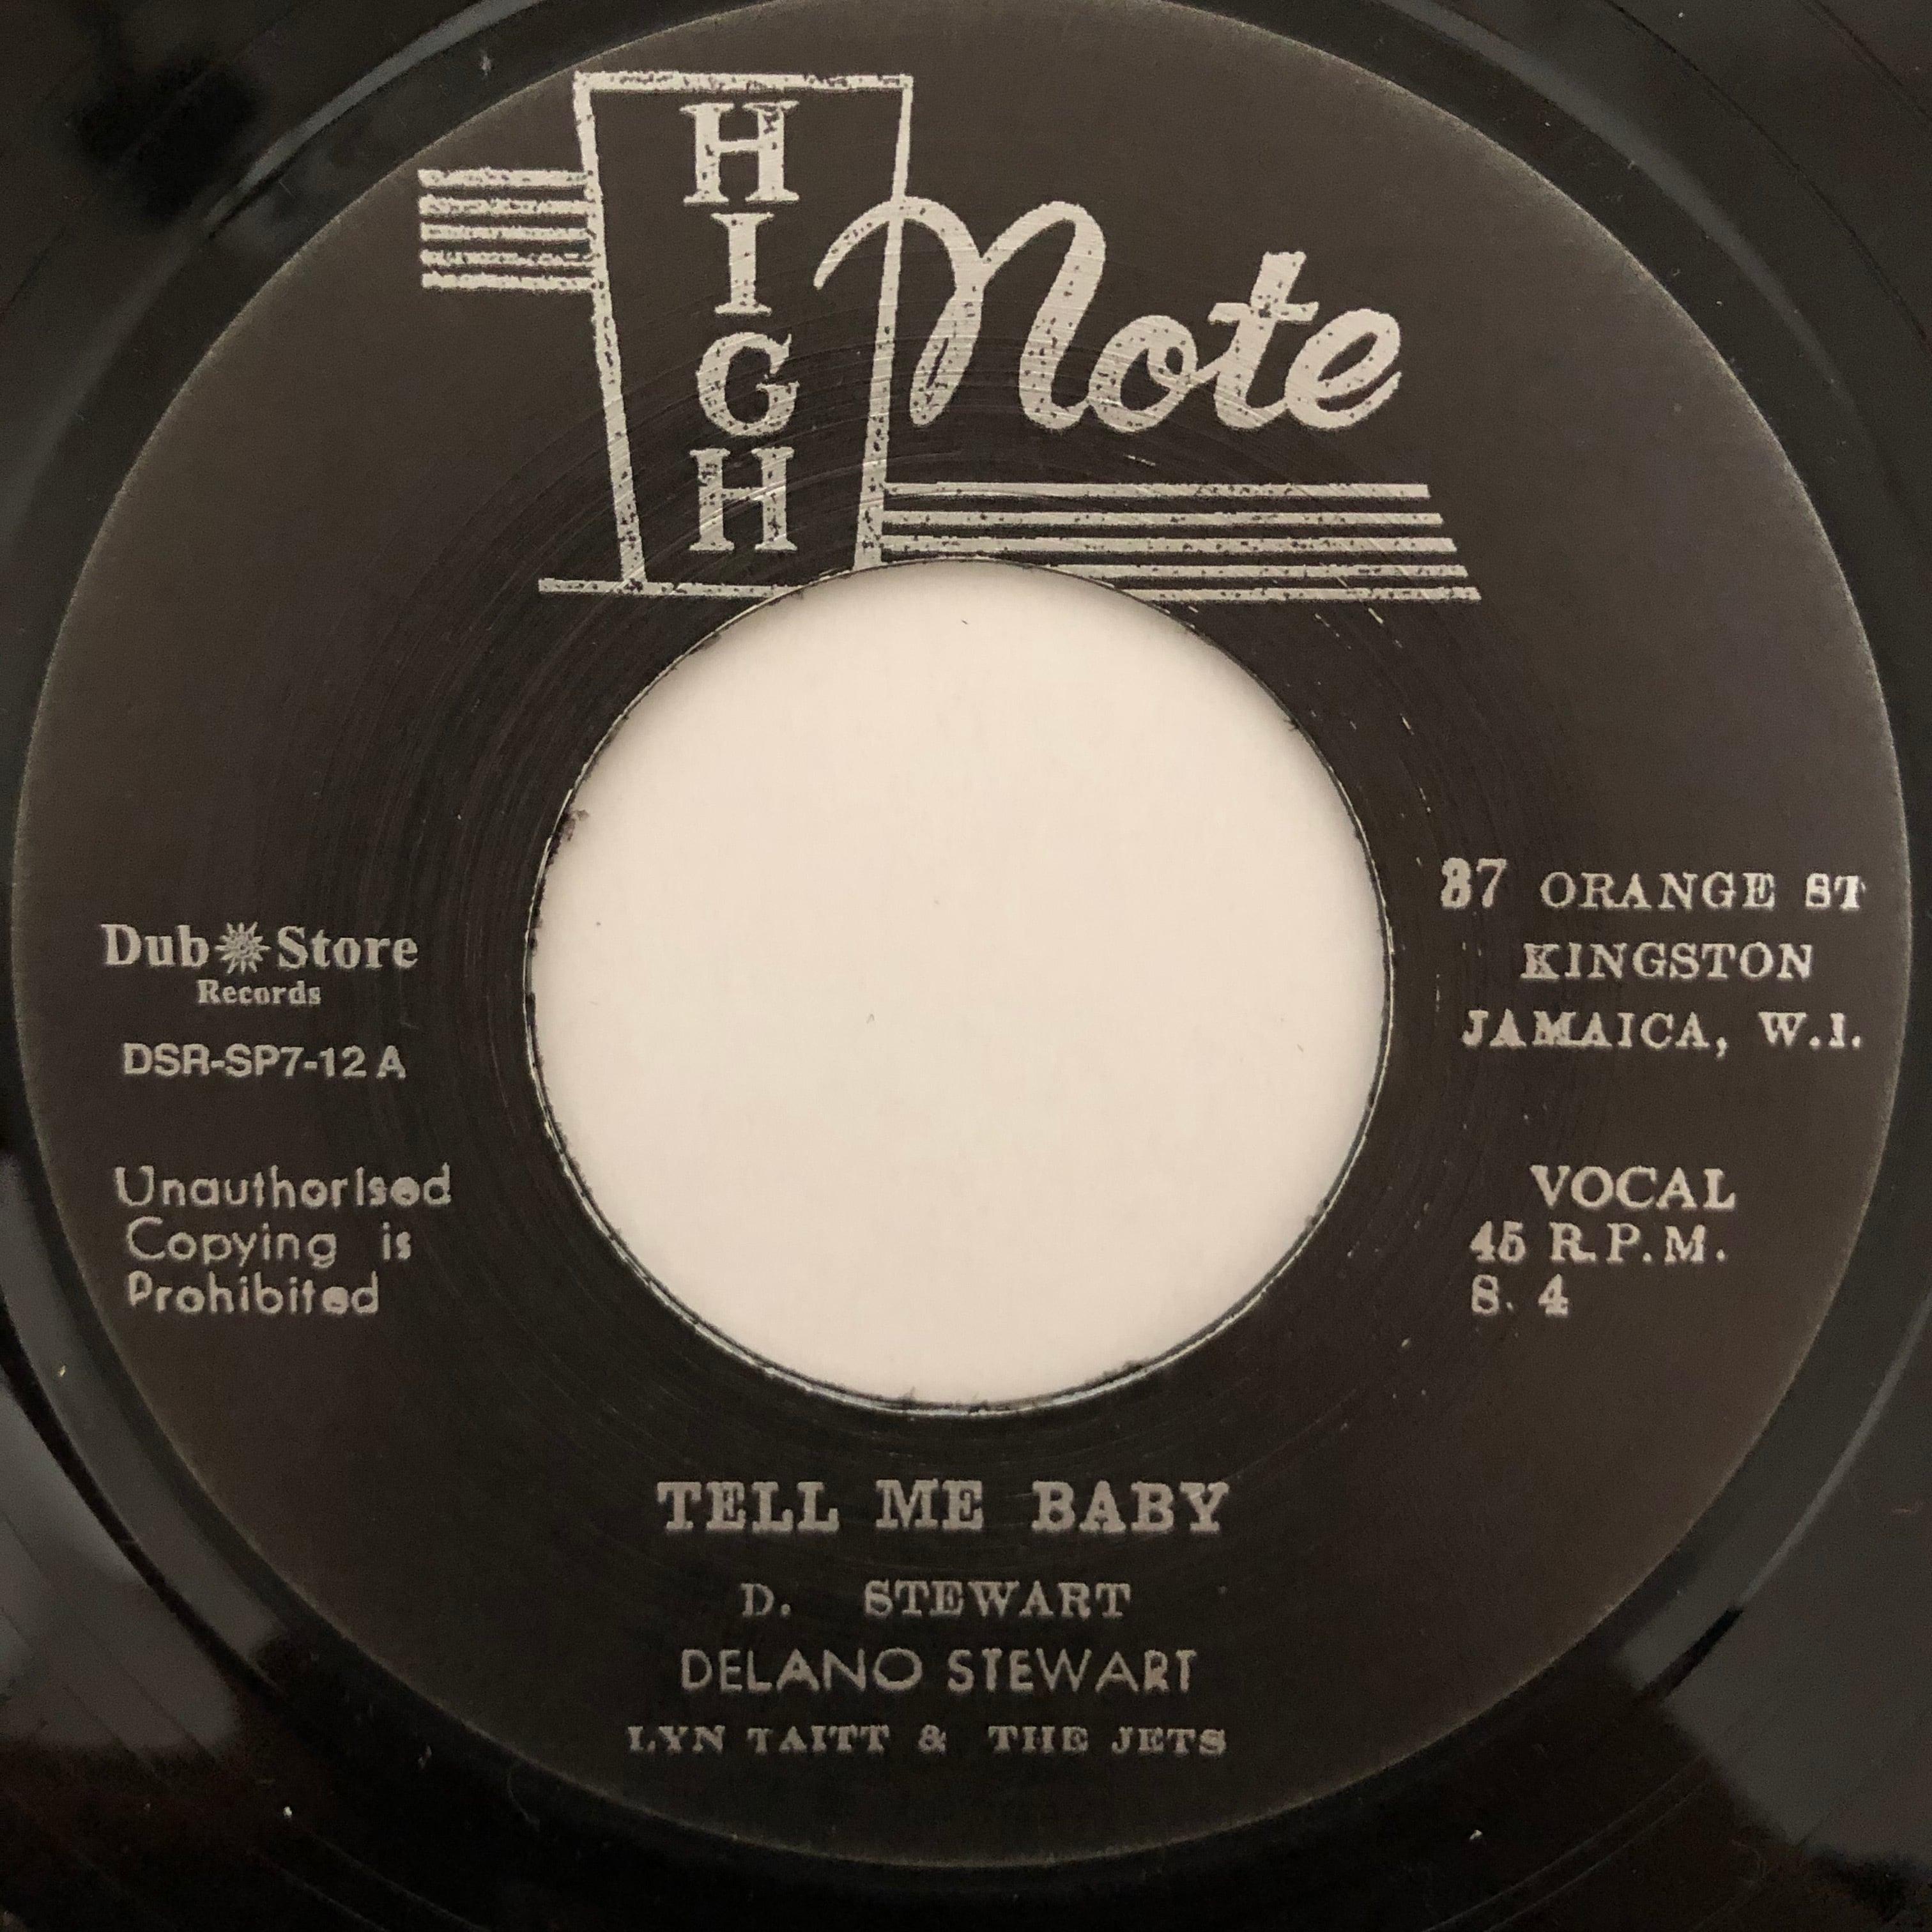 Delano Stewart - Tell Me Baby【7-20505】